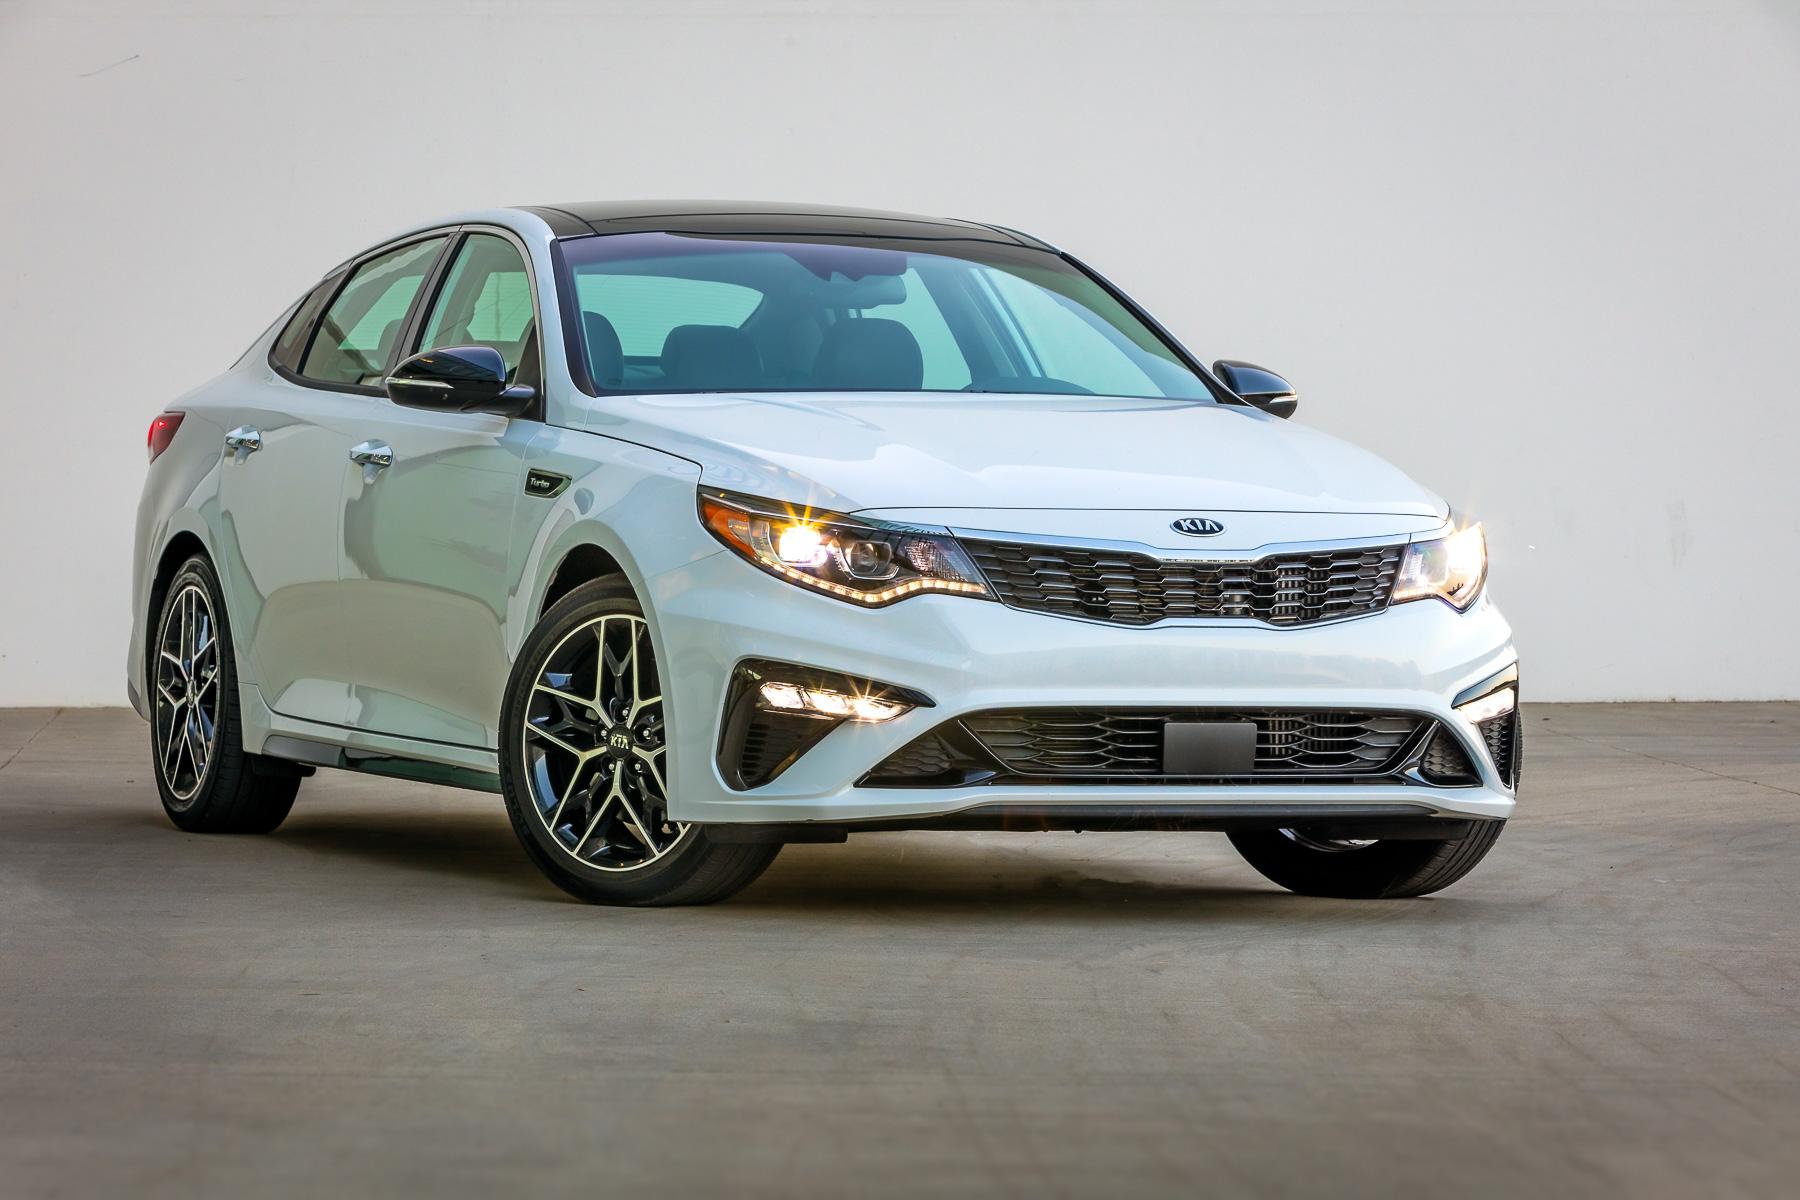 KIA - все модели КИА 2020: характеристики, цены, модификации ... | 1200x1800